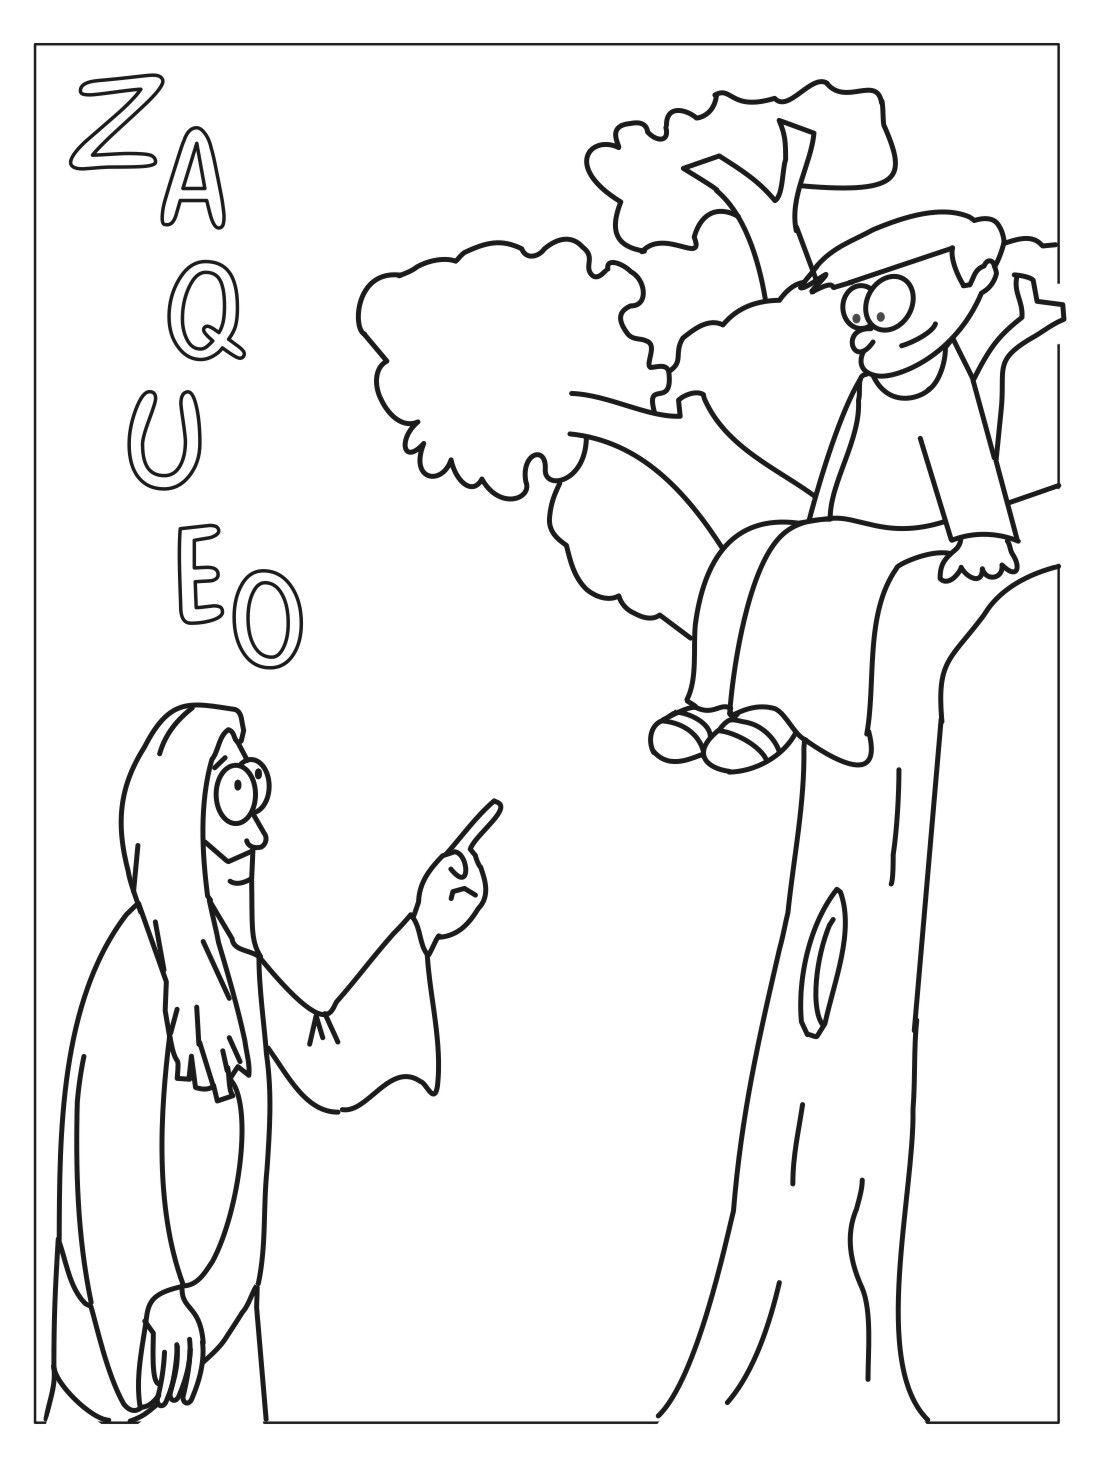 Dibujo para pintar sobre Zaqueo | dibujos biblicos | Pinterest ...